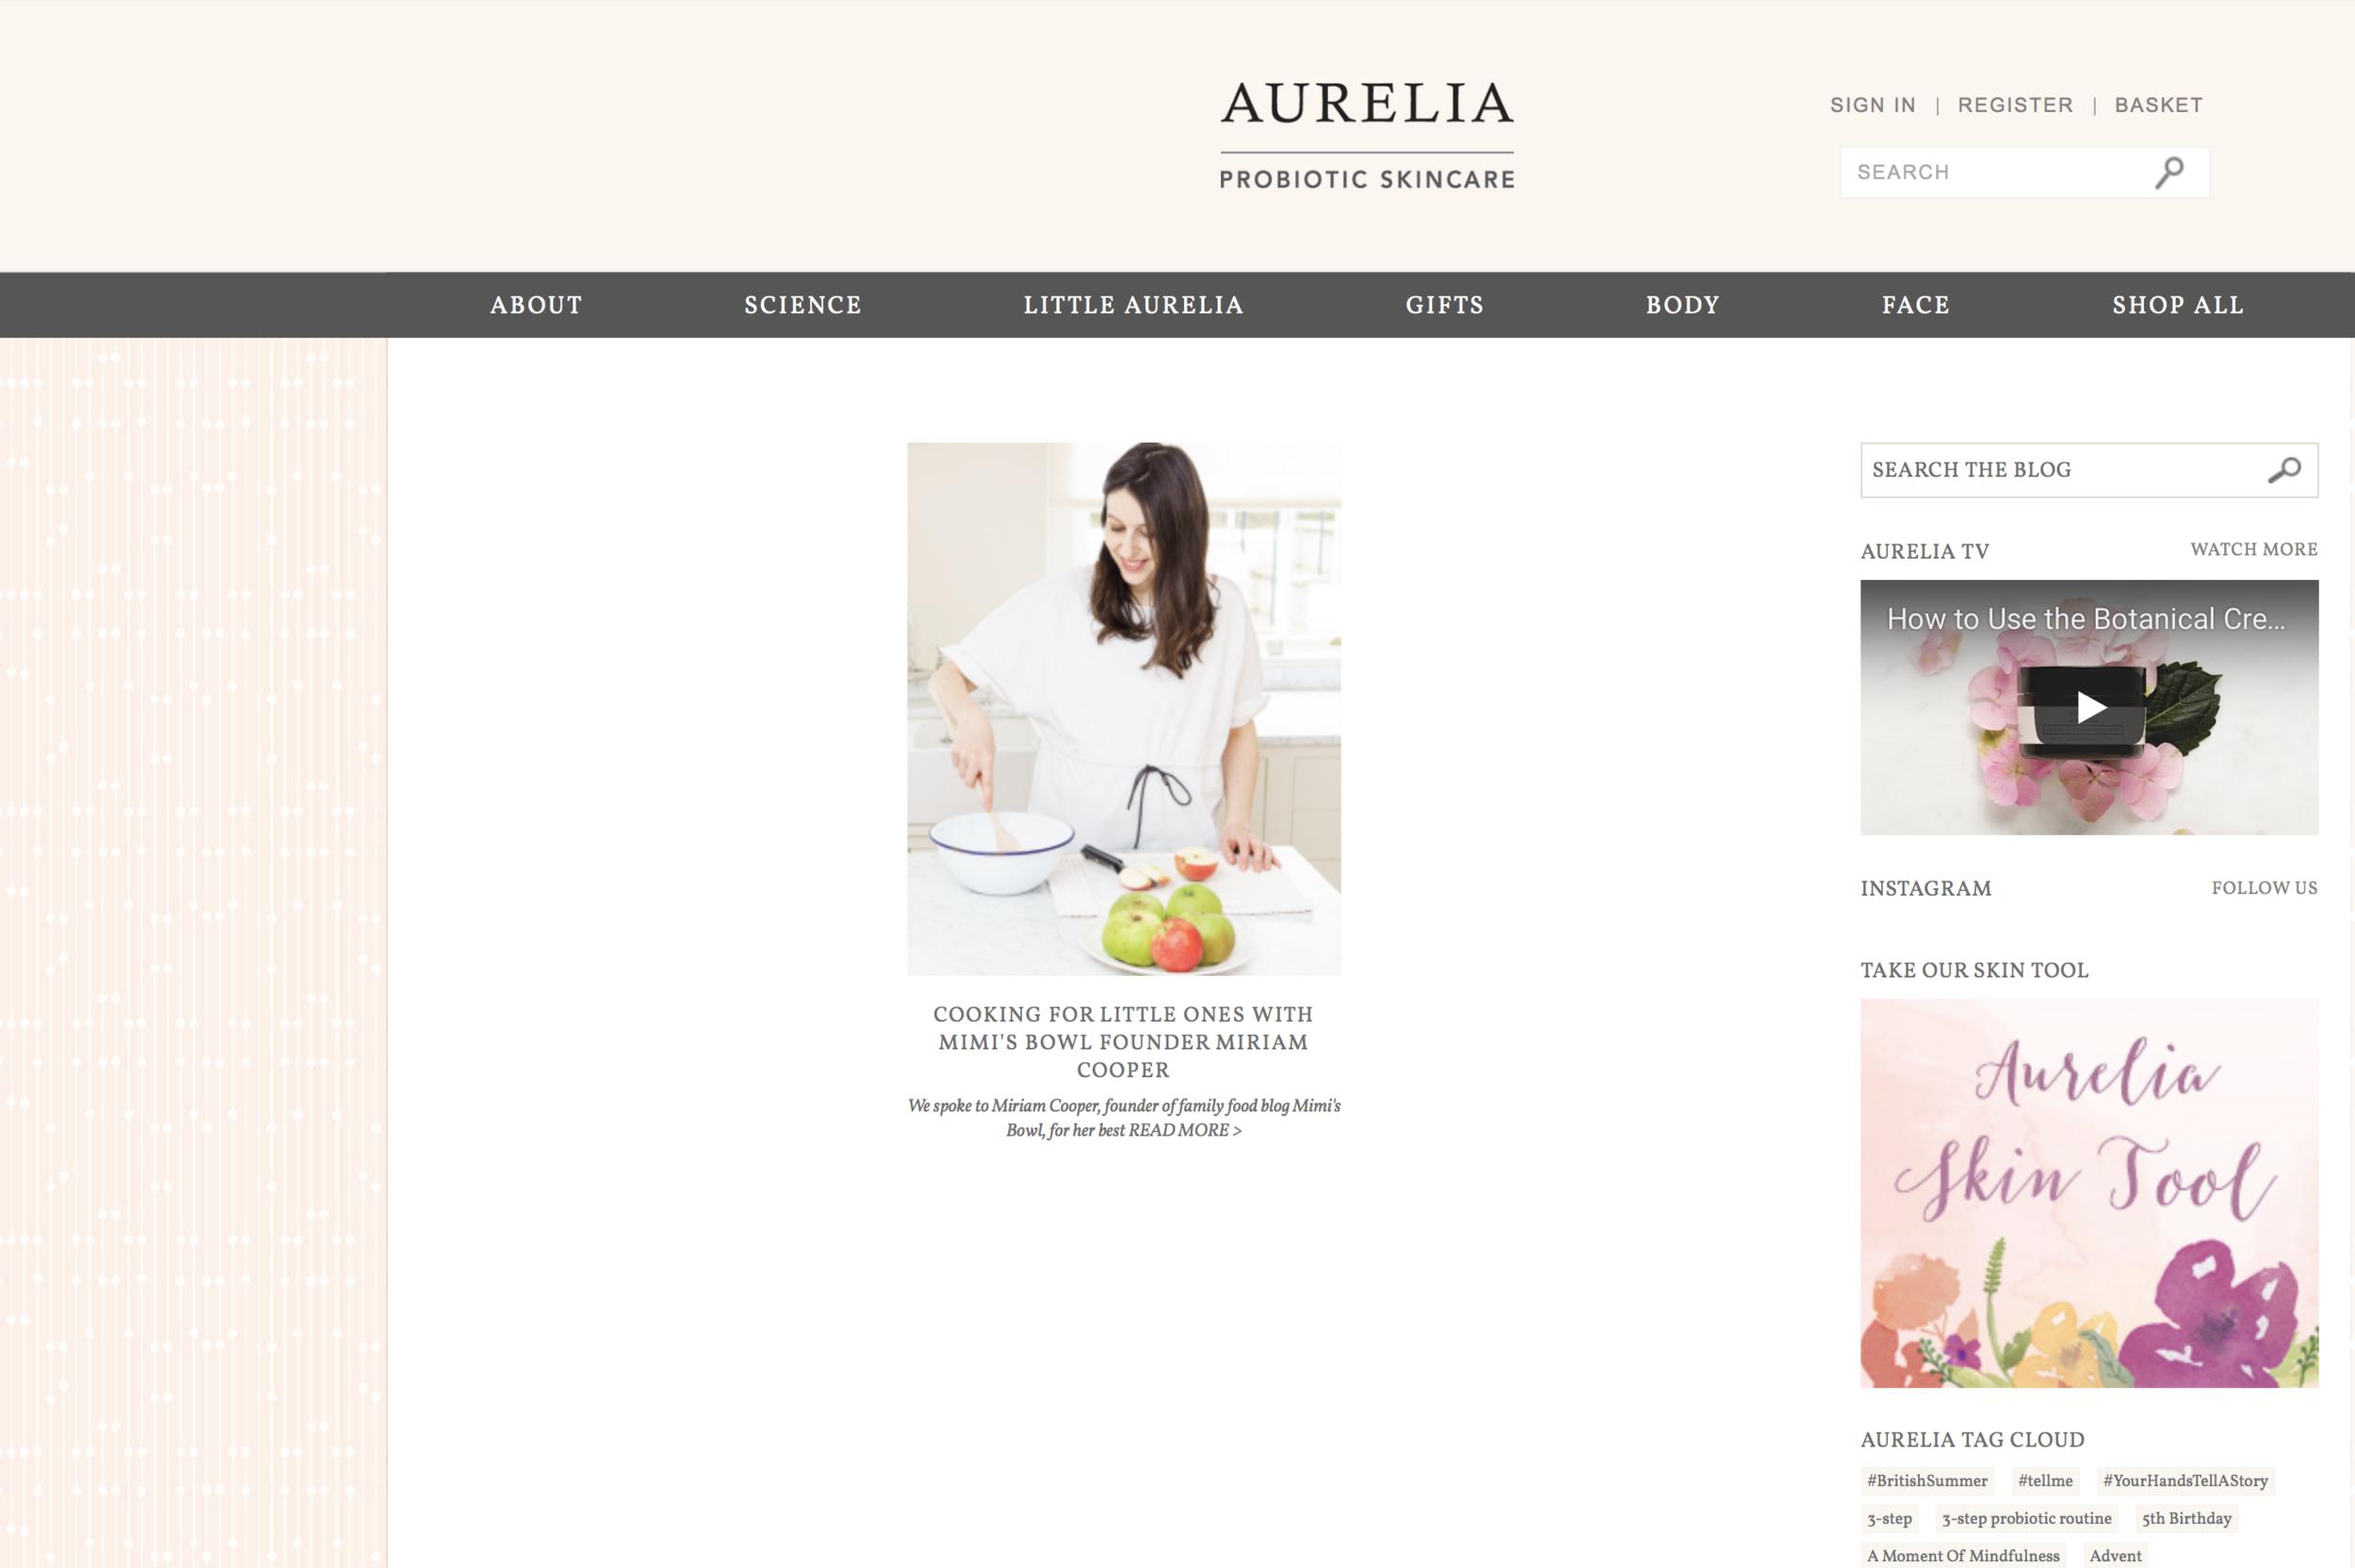 Little Aurelia 26.04.18 1 of 7.png